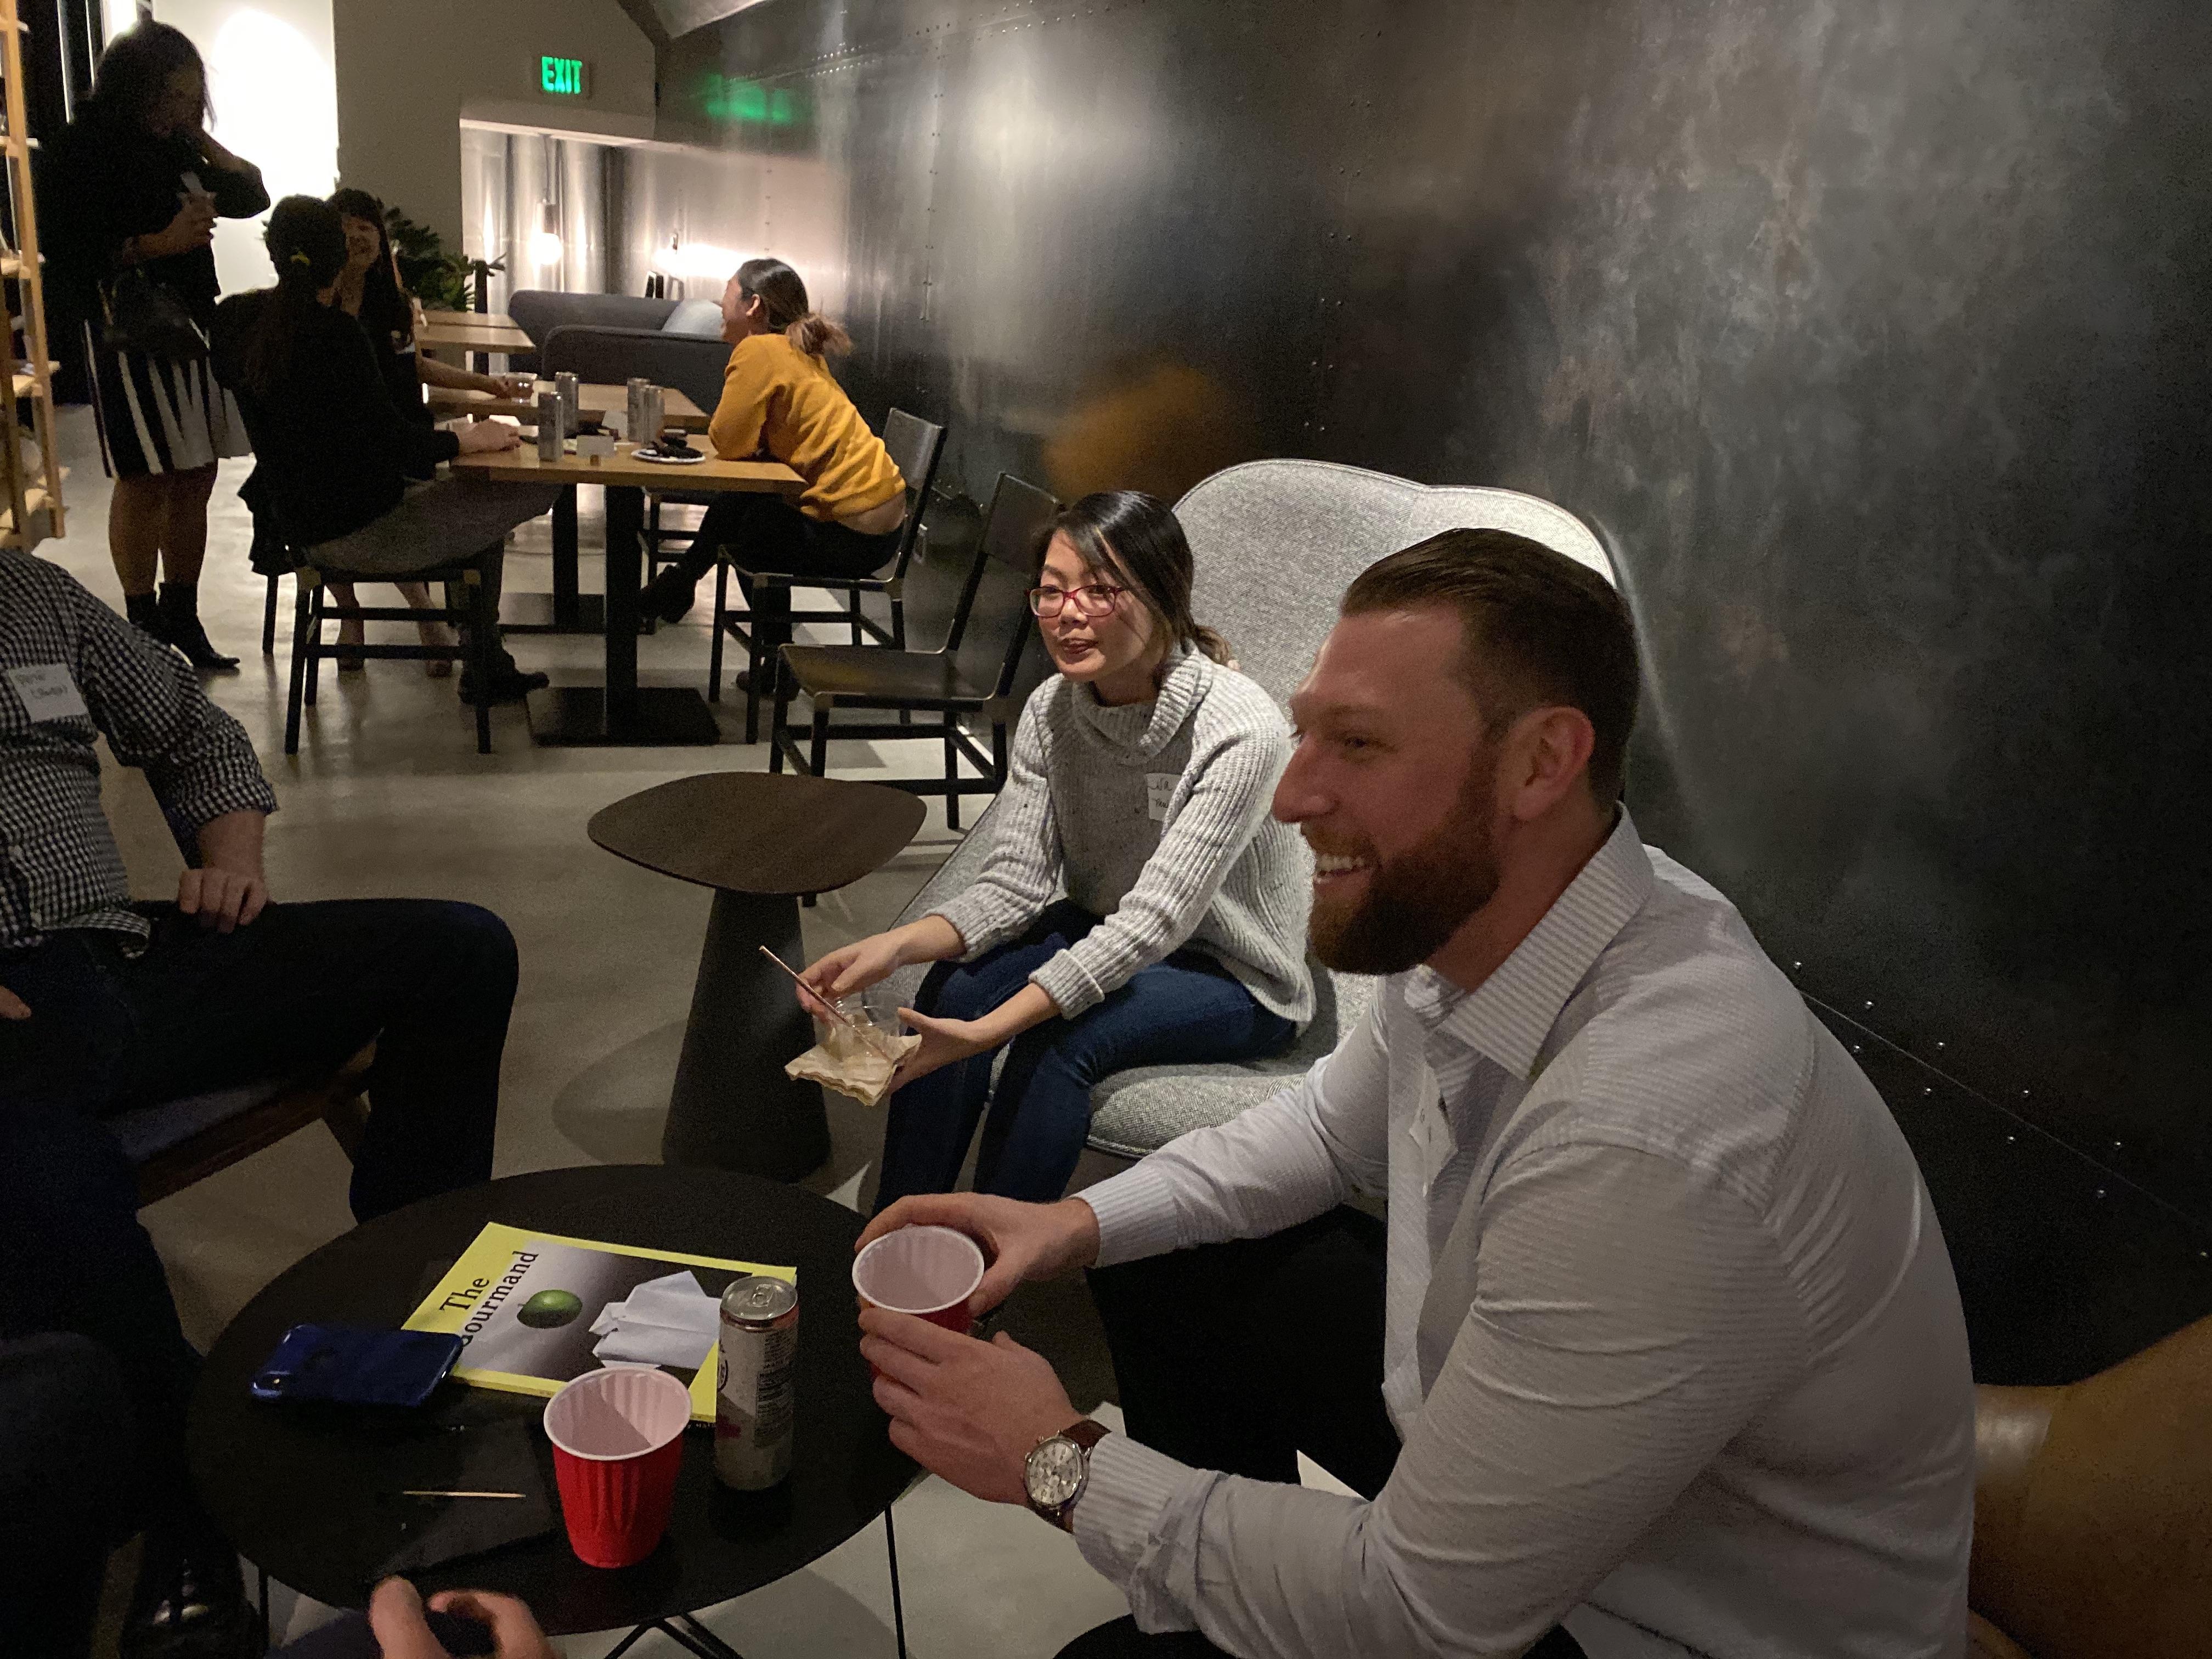 Paubox + Zentist Social Mixer at Brex Oval Room (pics): Lisa Mai and Greg Hoffman